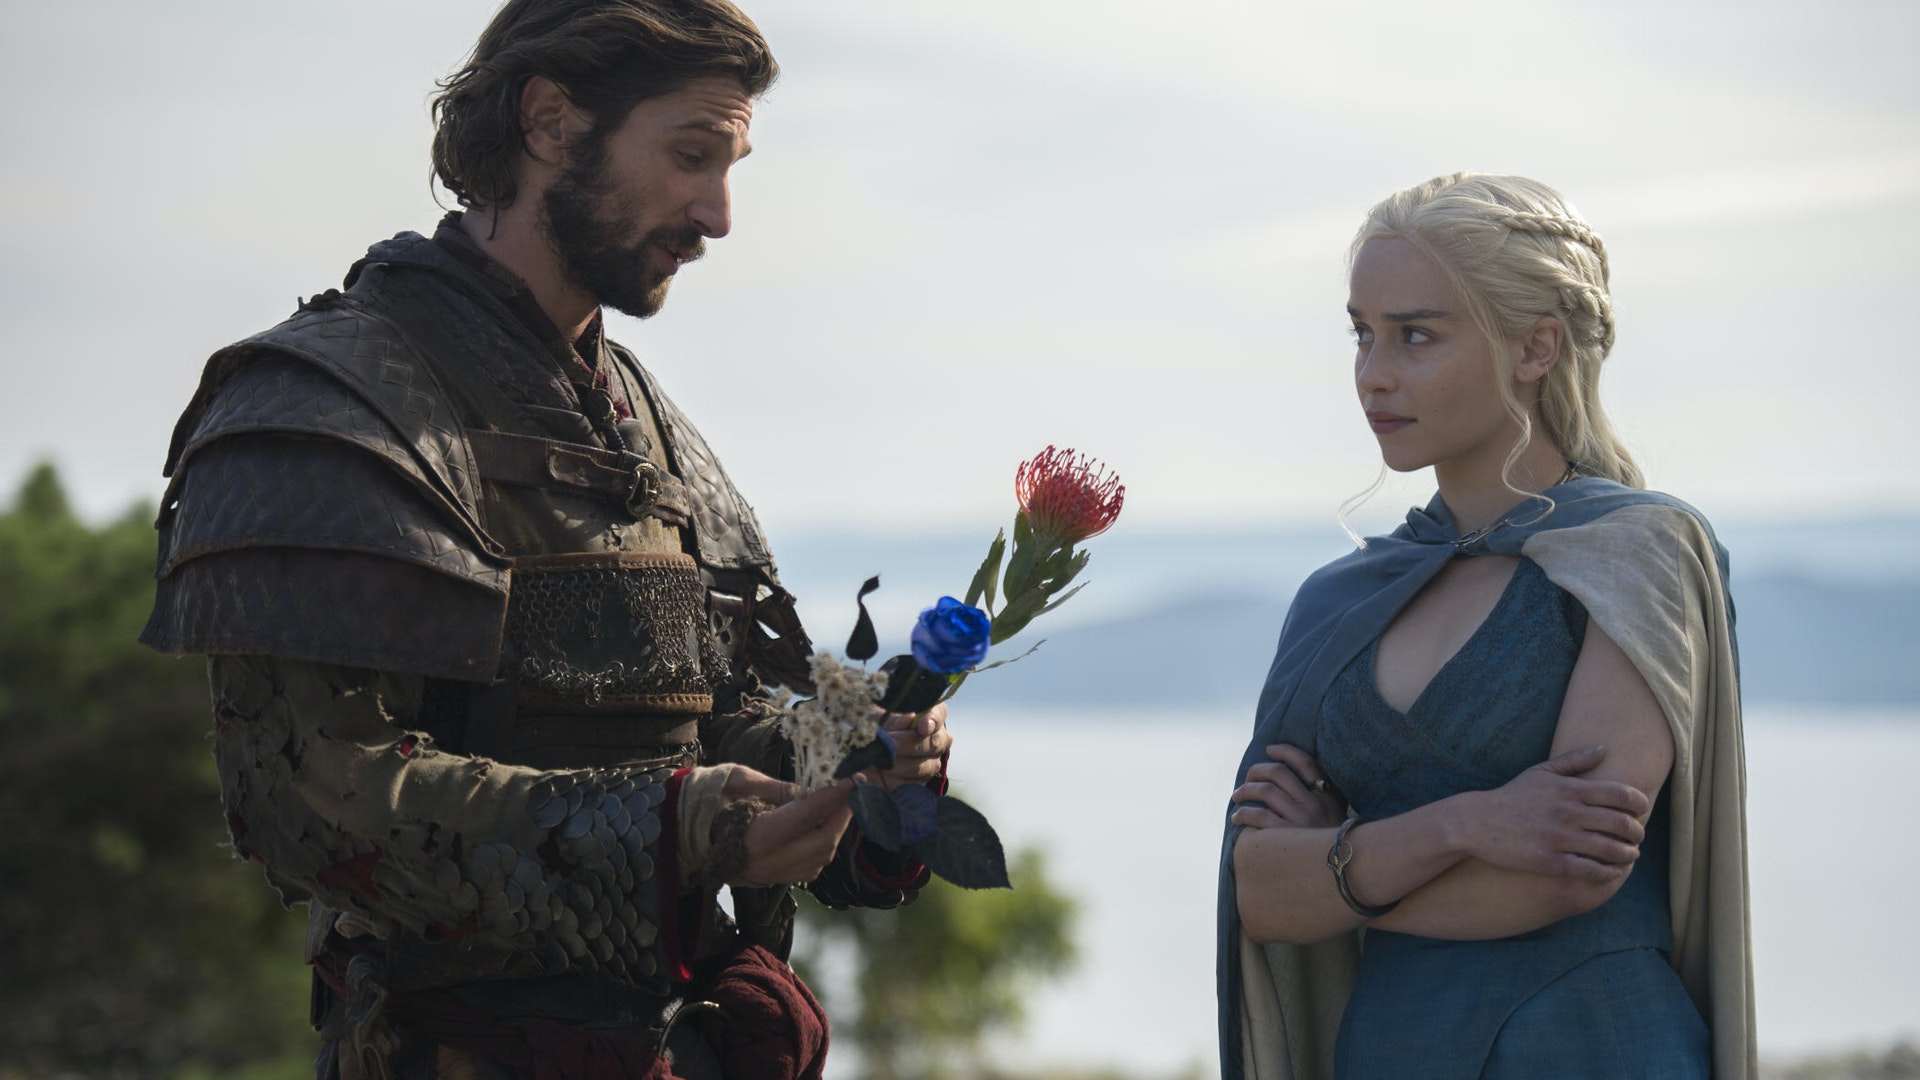 Season-4-Episode-1-Two-Swords-game-of-thrones-36908459-2100-1398